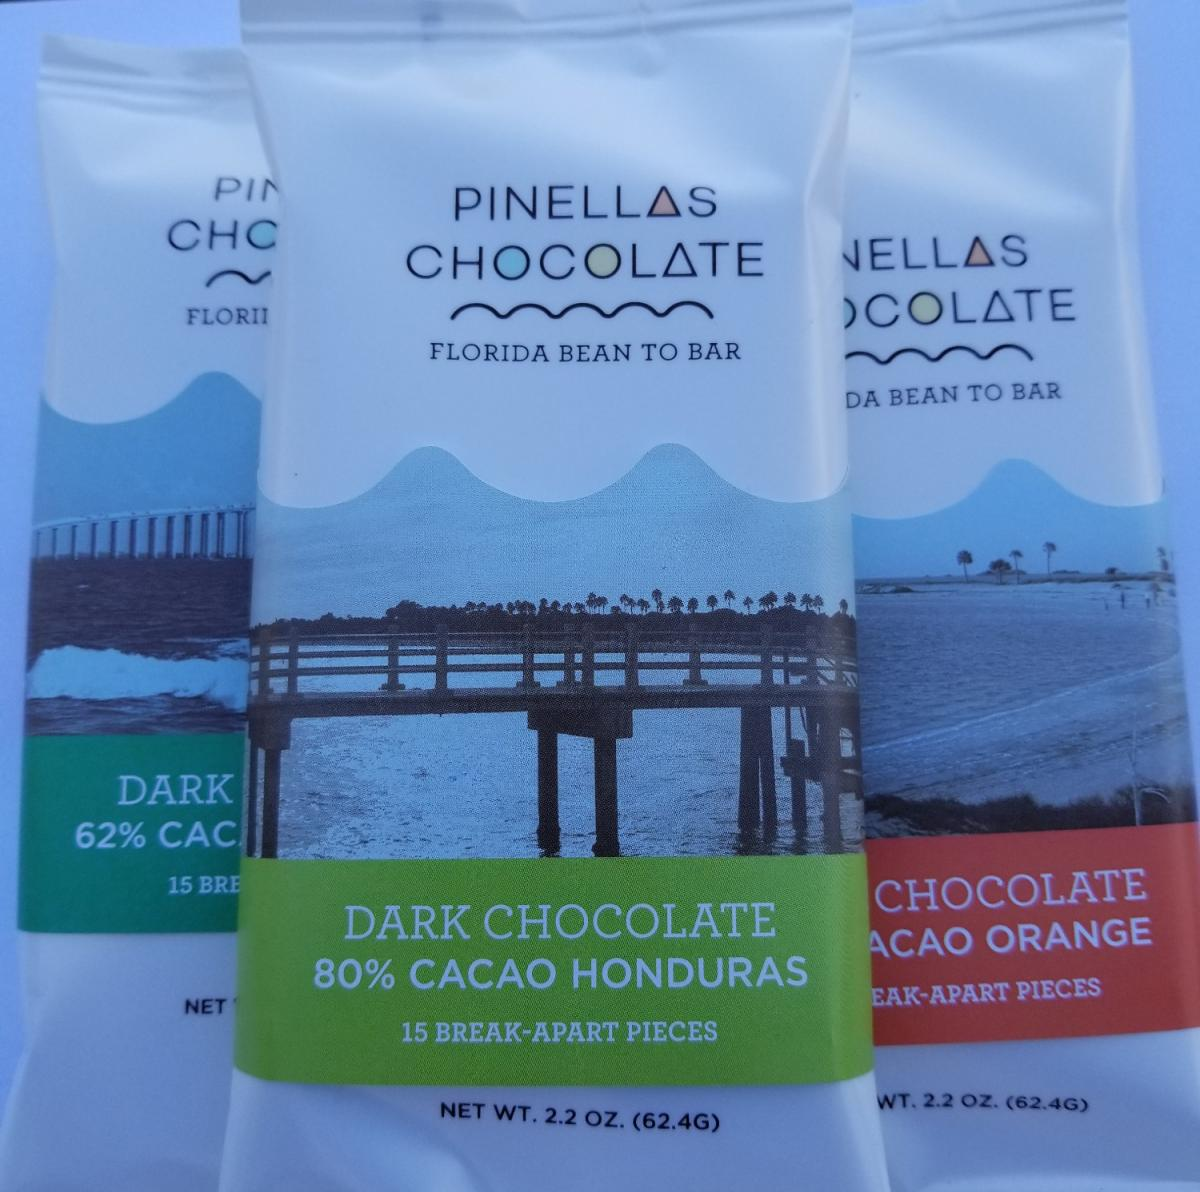 Pinellas Chocolate Company Creates Delicious Craft Chocolate in Largo